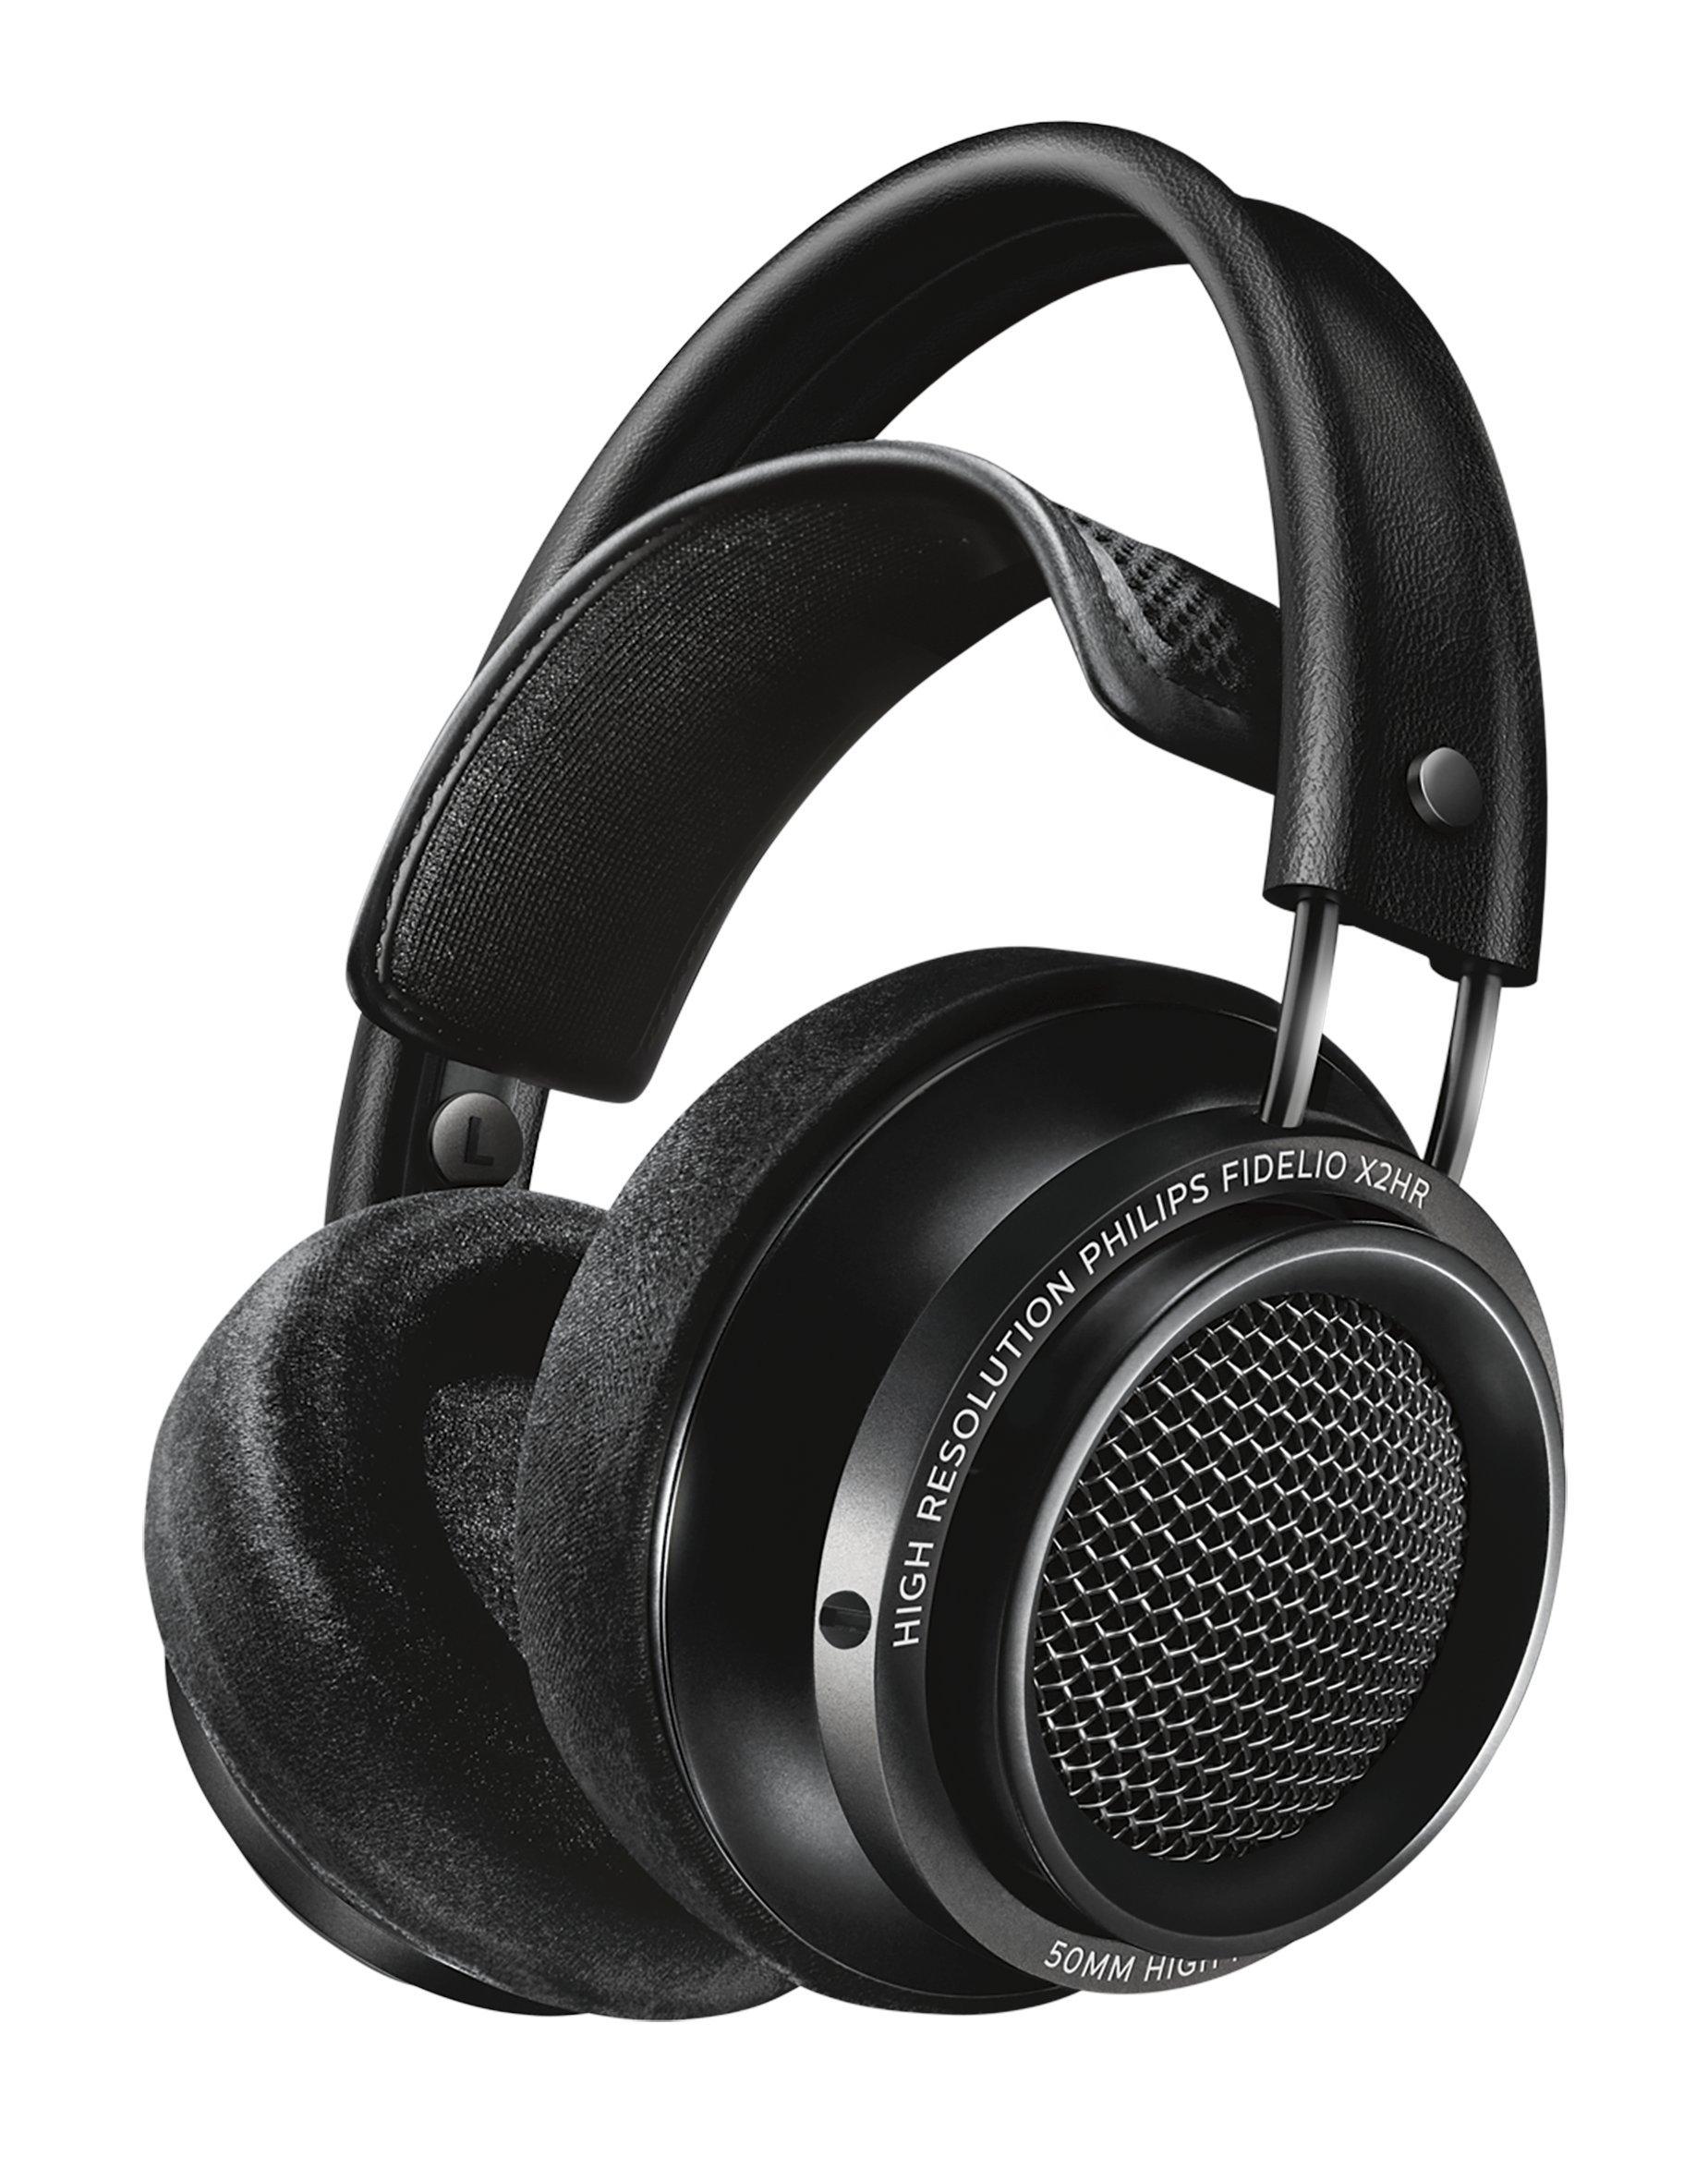 Philips X2HR Fidelio Over Ear Headphone, Black by Philips Audio